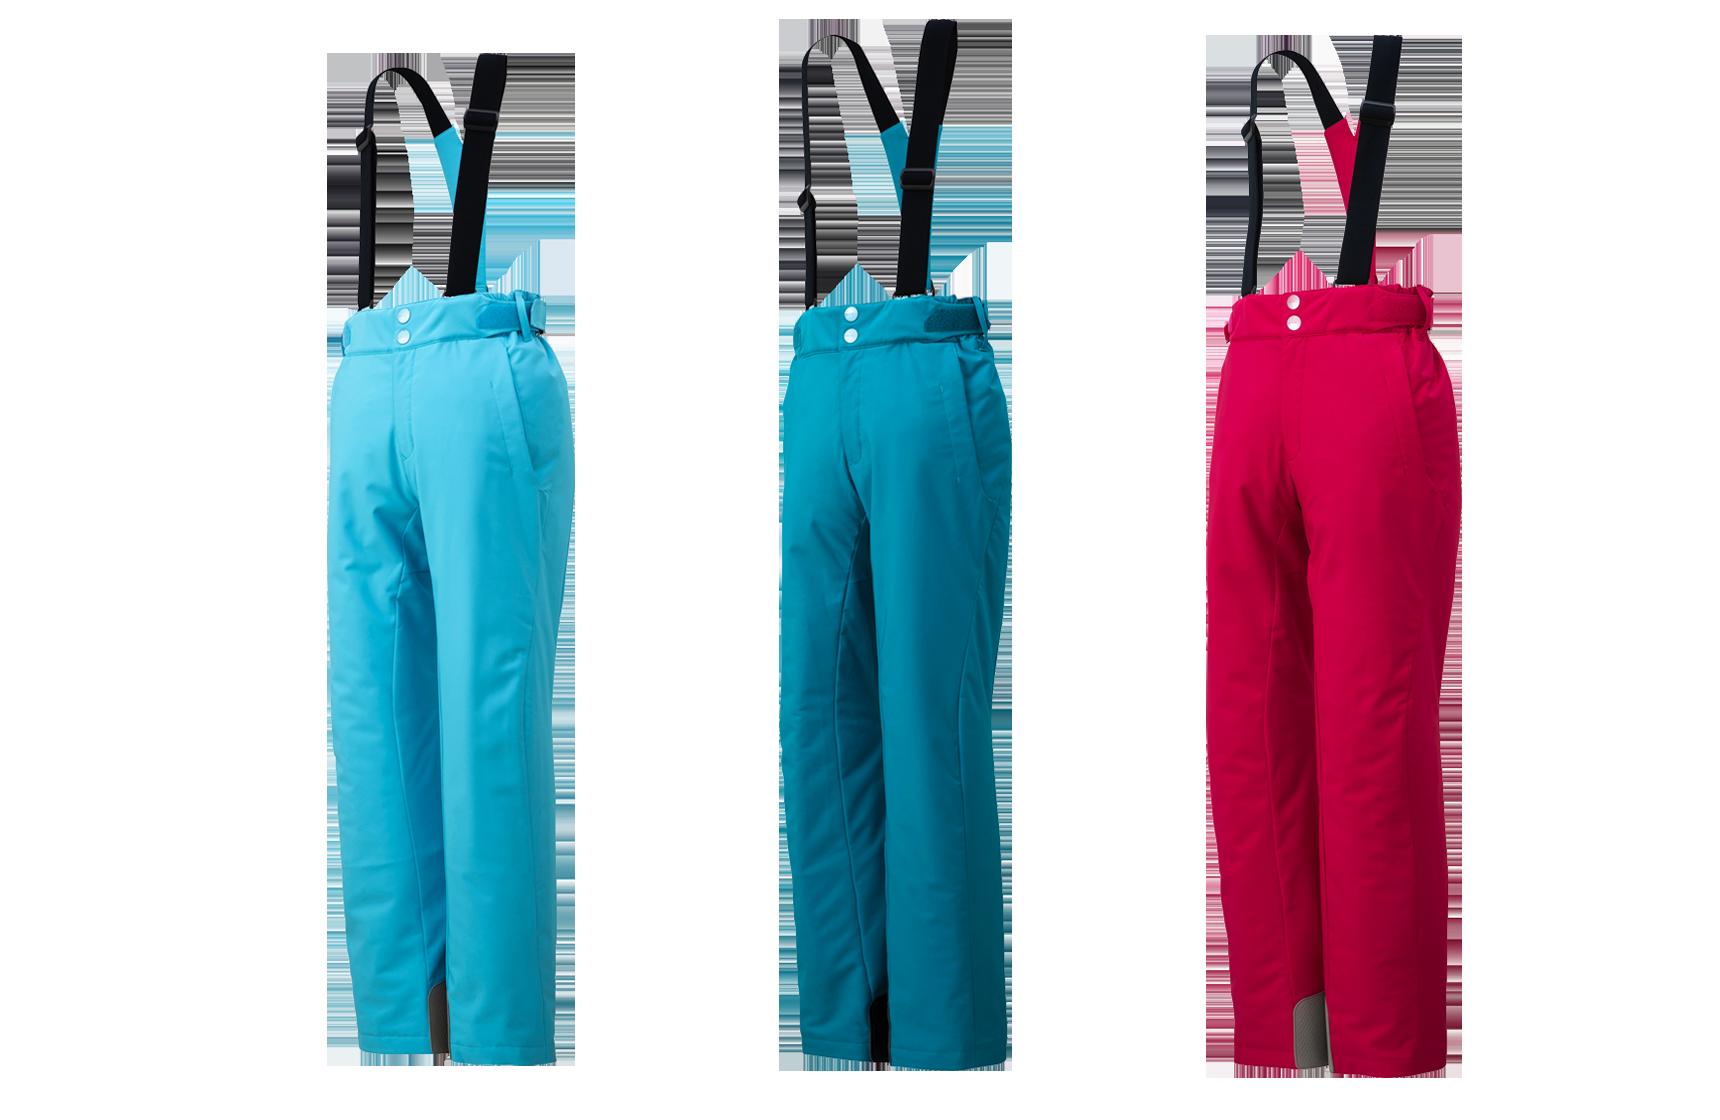 LAXING INSULATED WOMEN'S PANTS